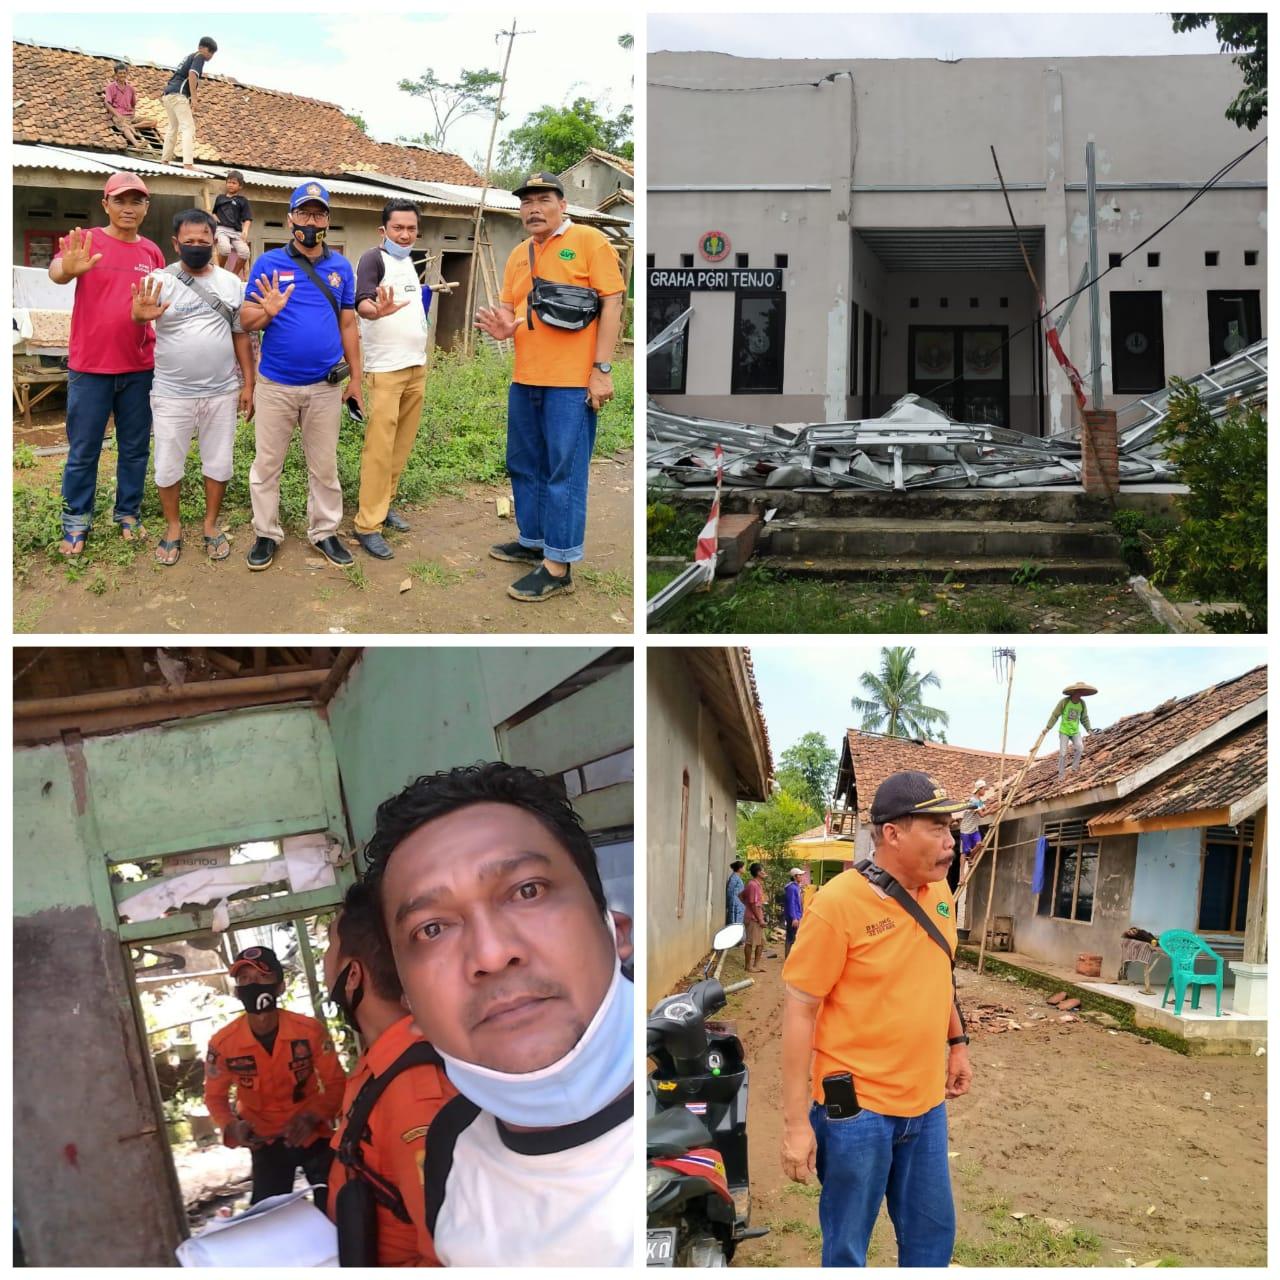 Usai Dilanda Hujan Disertai Angin Kencang, Warga Desa Singabraja Gotong Royong Perbaiki Rumah